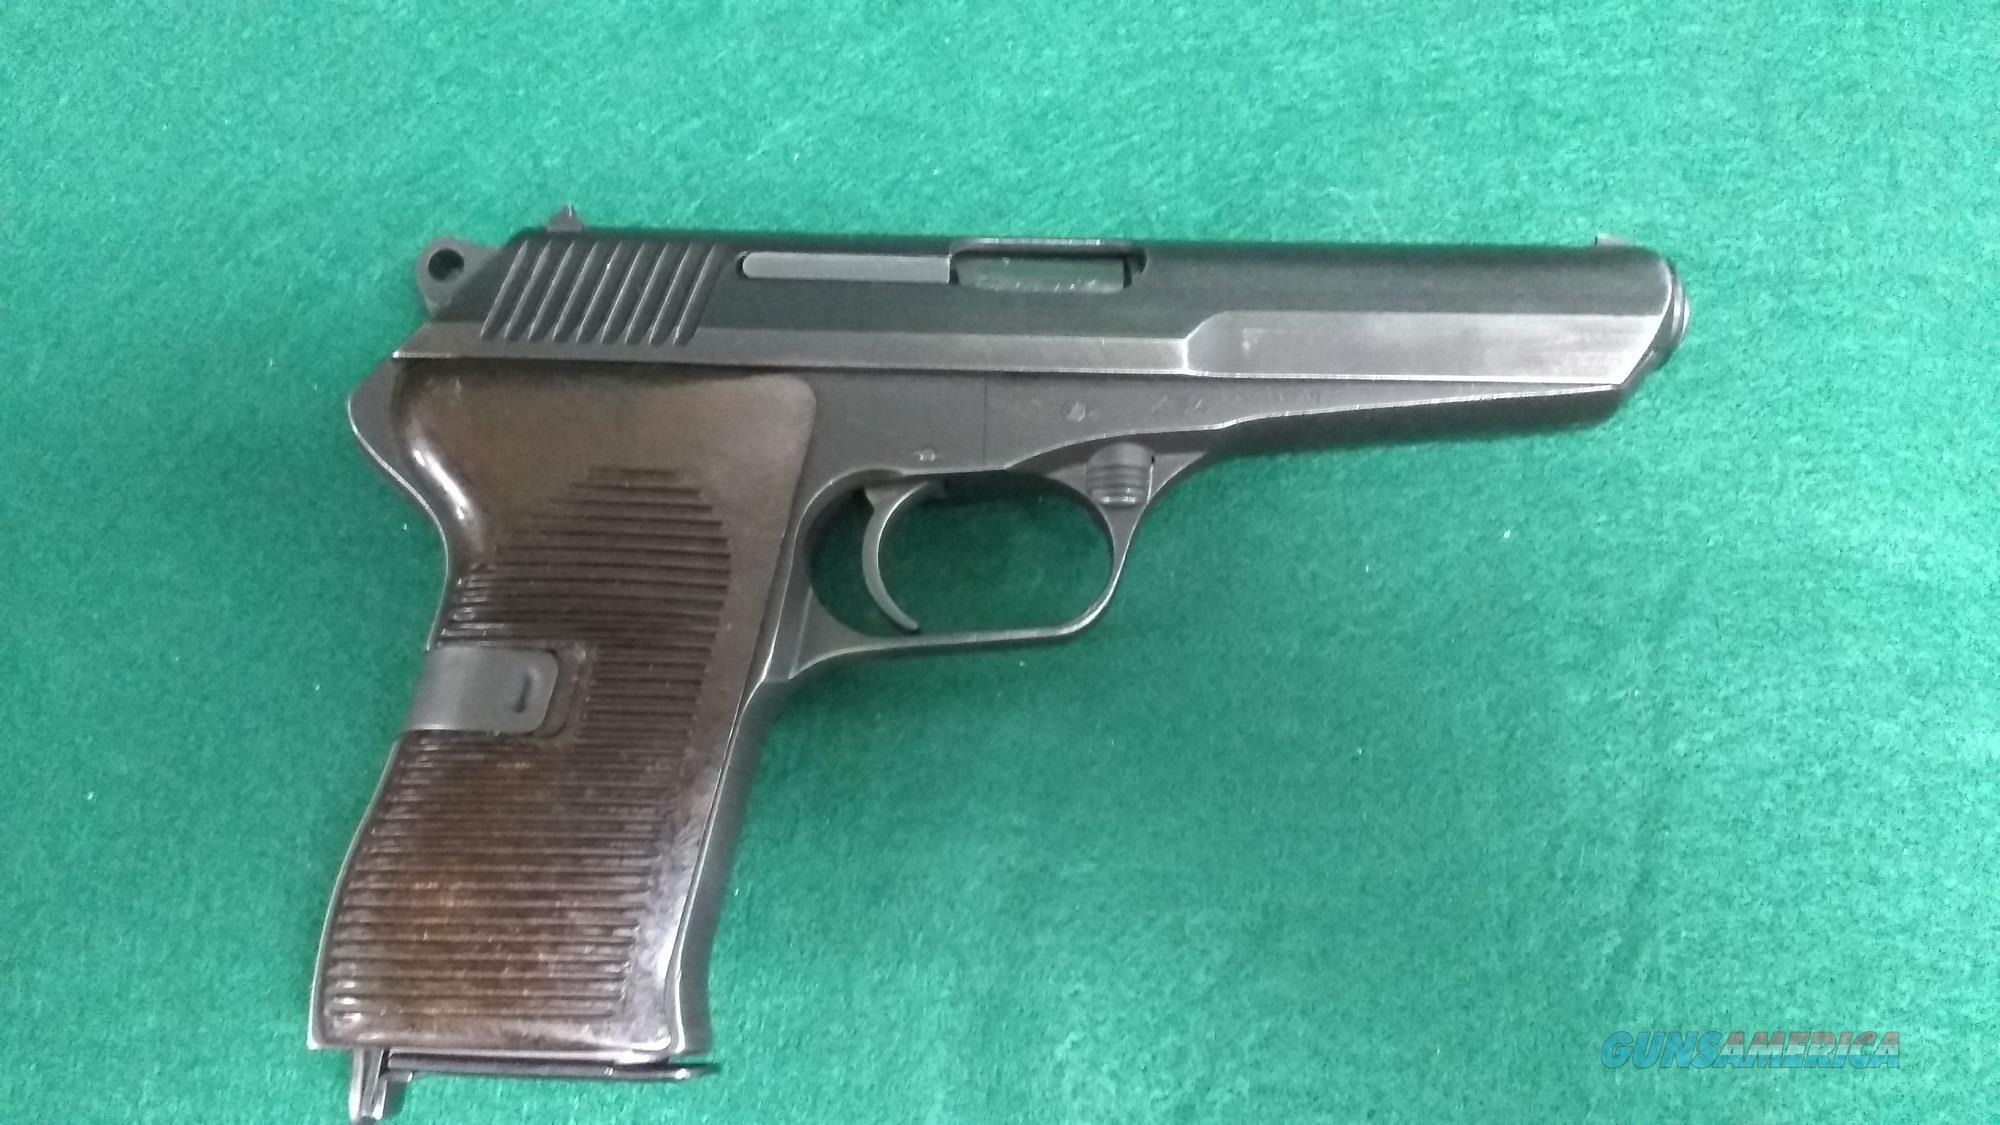 CZ-52 7.62x25mm Tokarev   Guns > Pistols > CZ Pistols